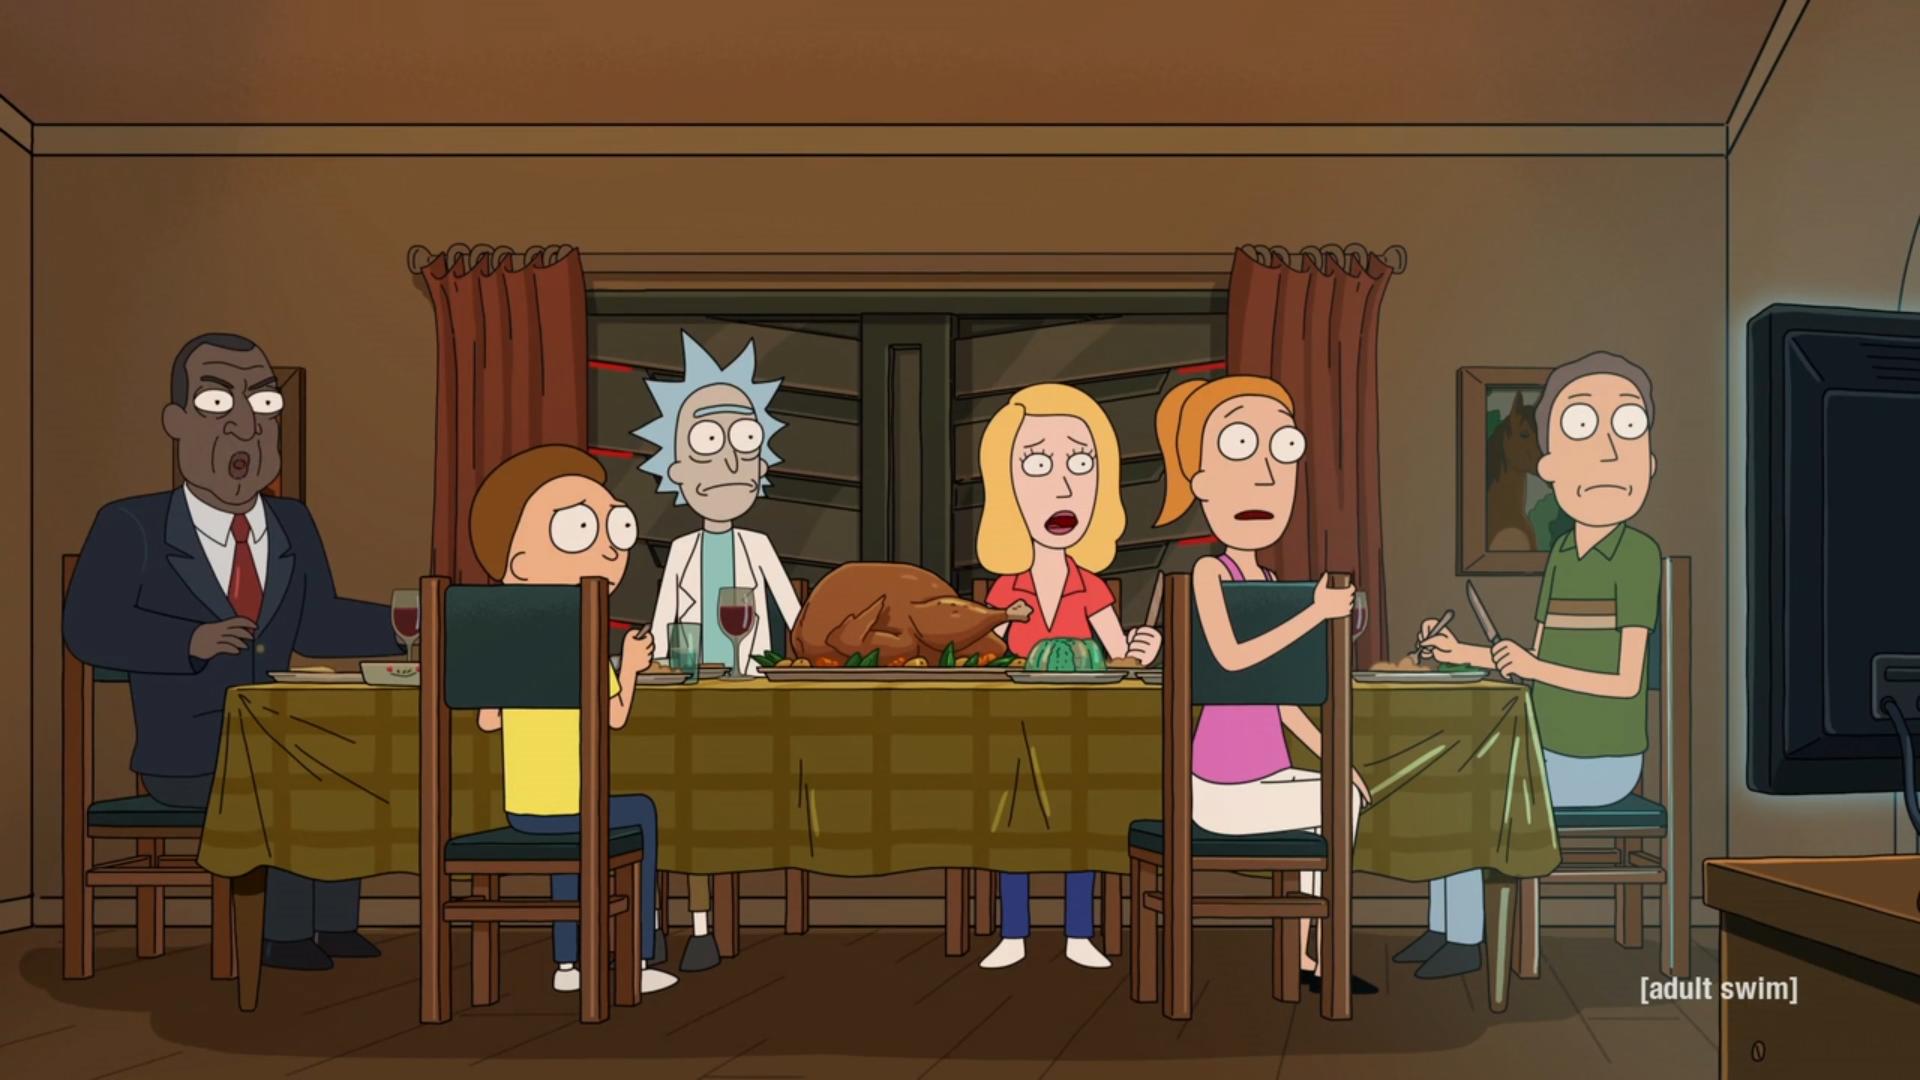 Rick and Morty S05E06